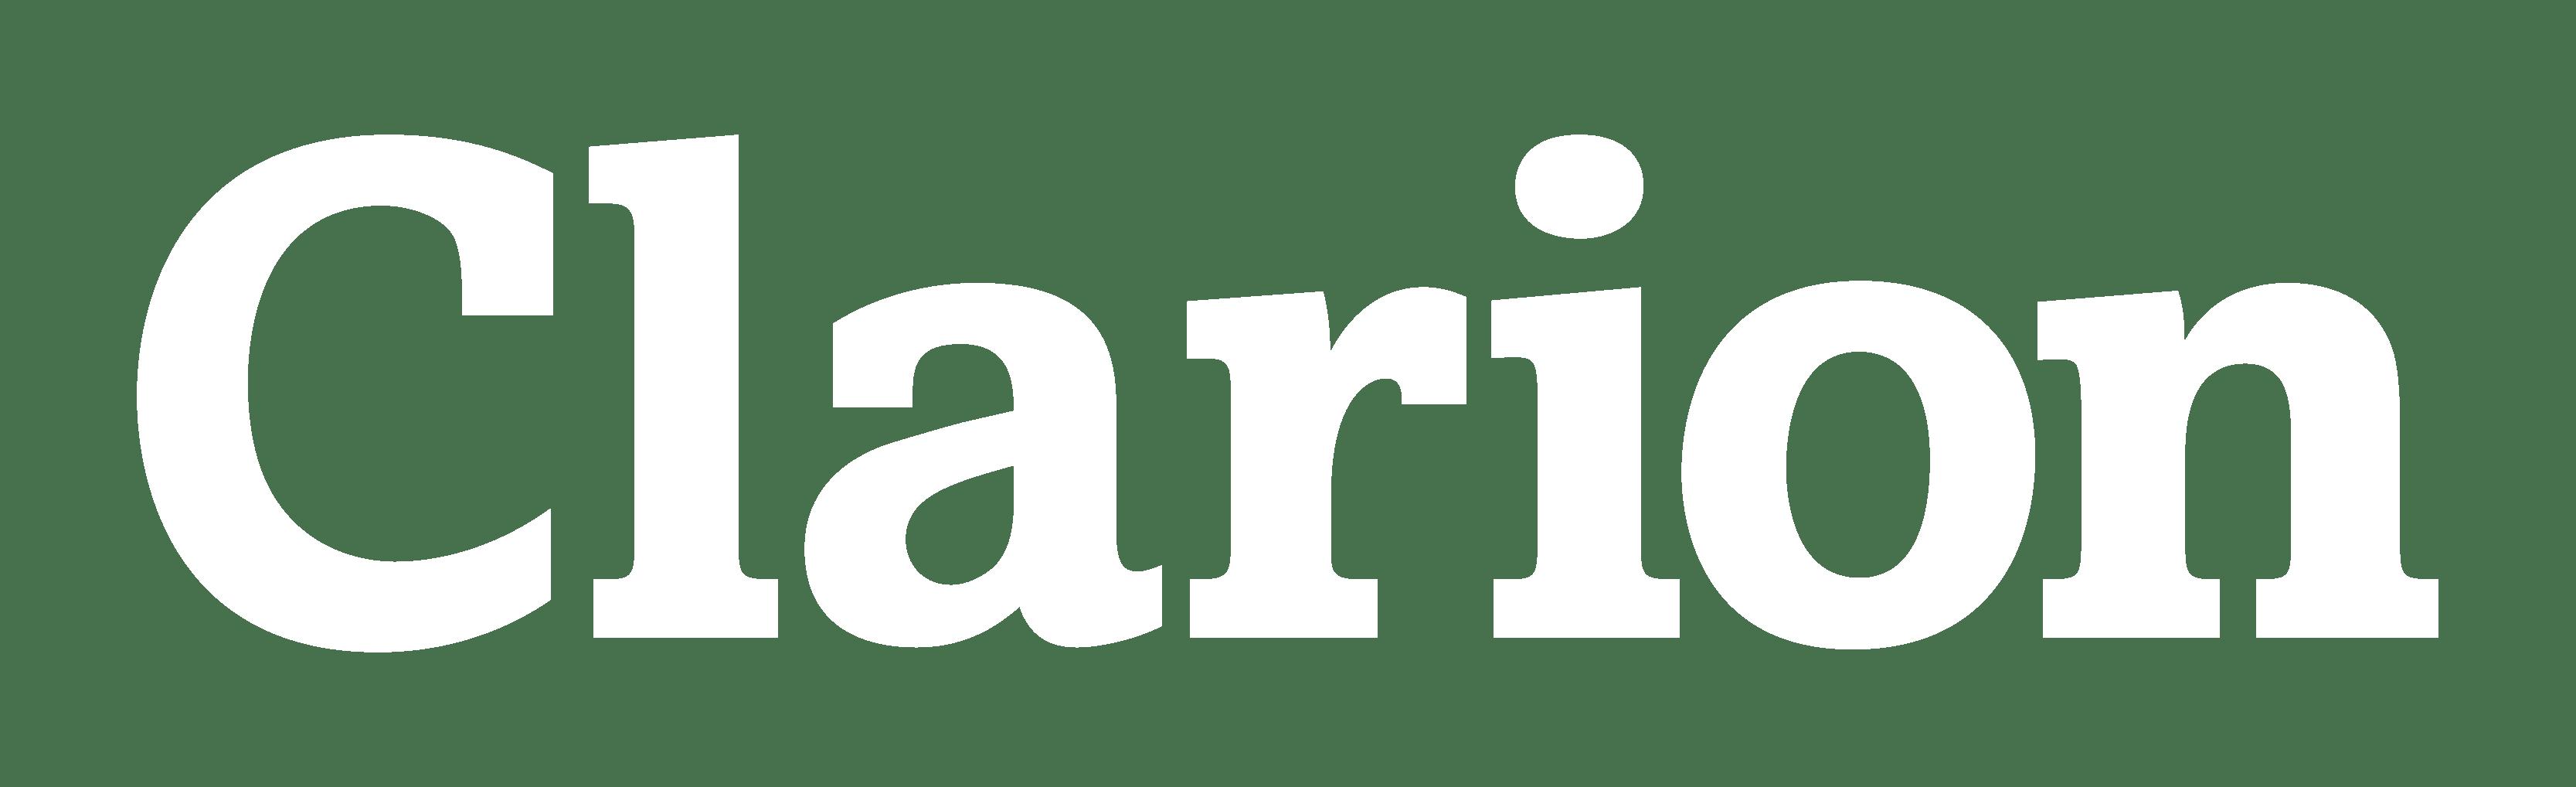 Clarionlegalcosts.com